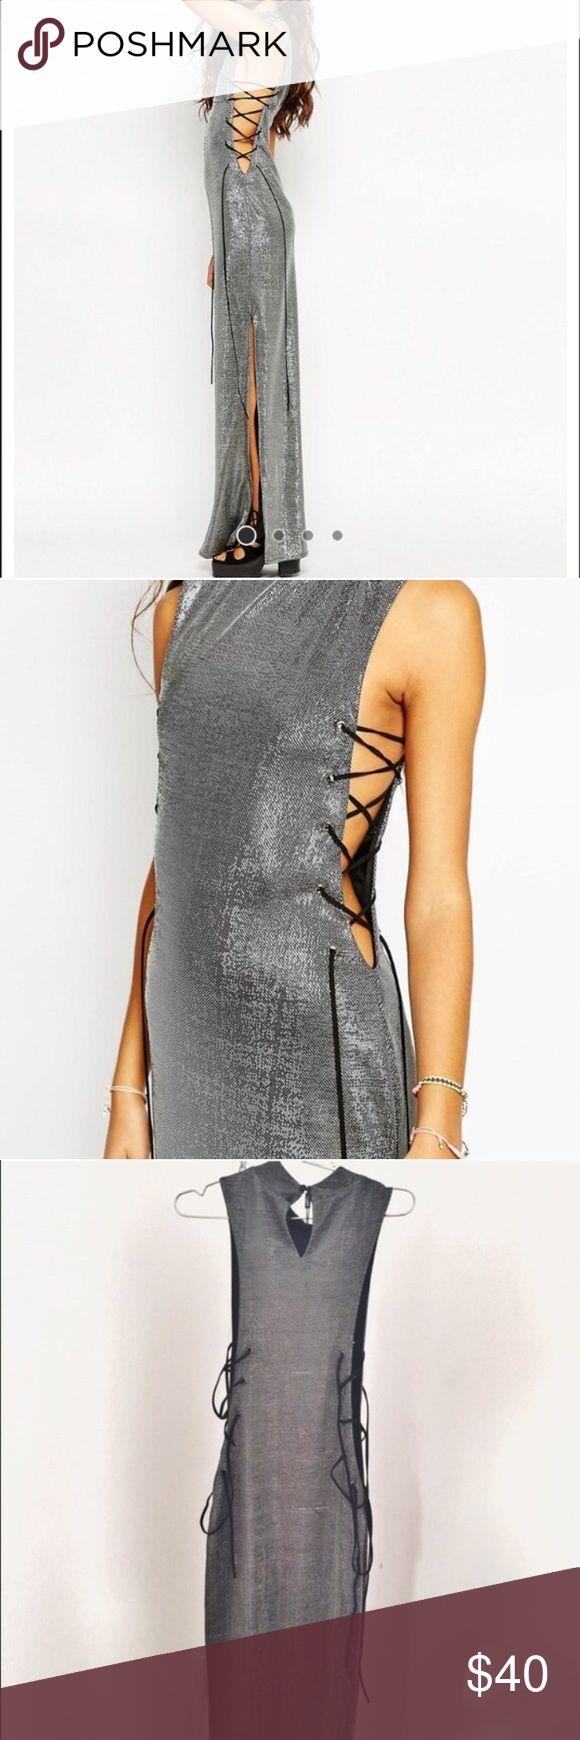 Asos jaded london metallic maxi dress !!! Metallic maxi dress super formal sexy for perfect occasion ASOS Dresses Maxi